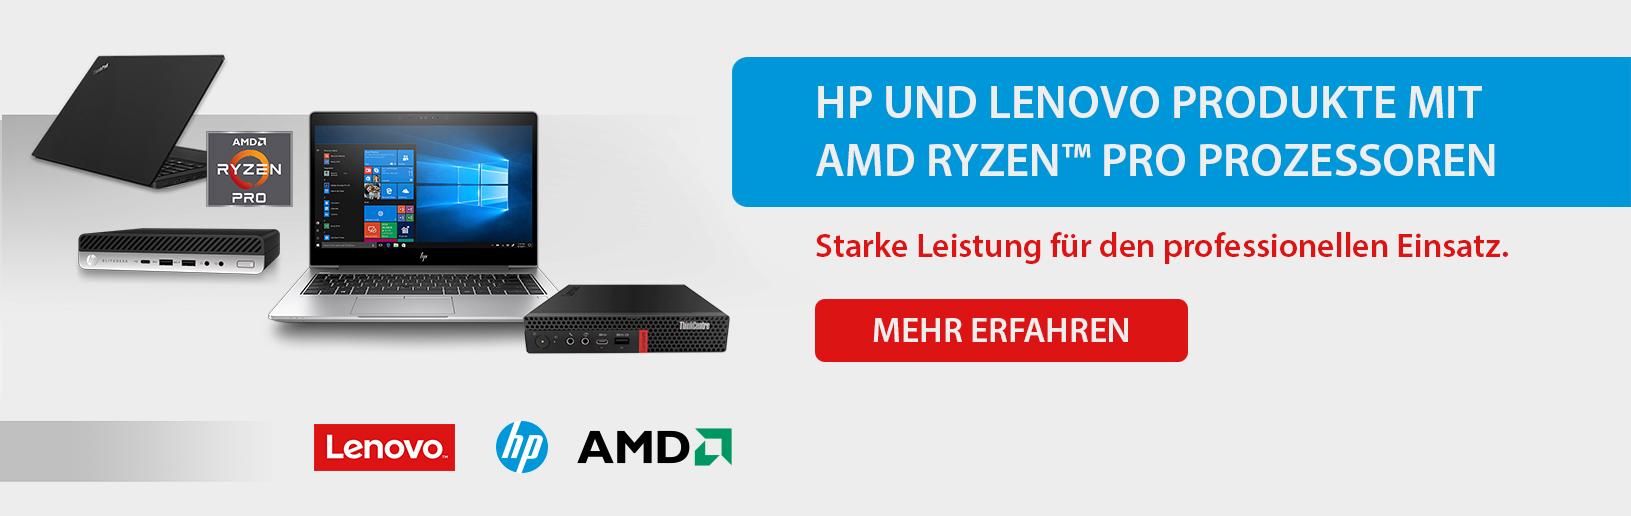 Amd-Lenovo-HP